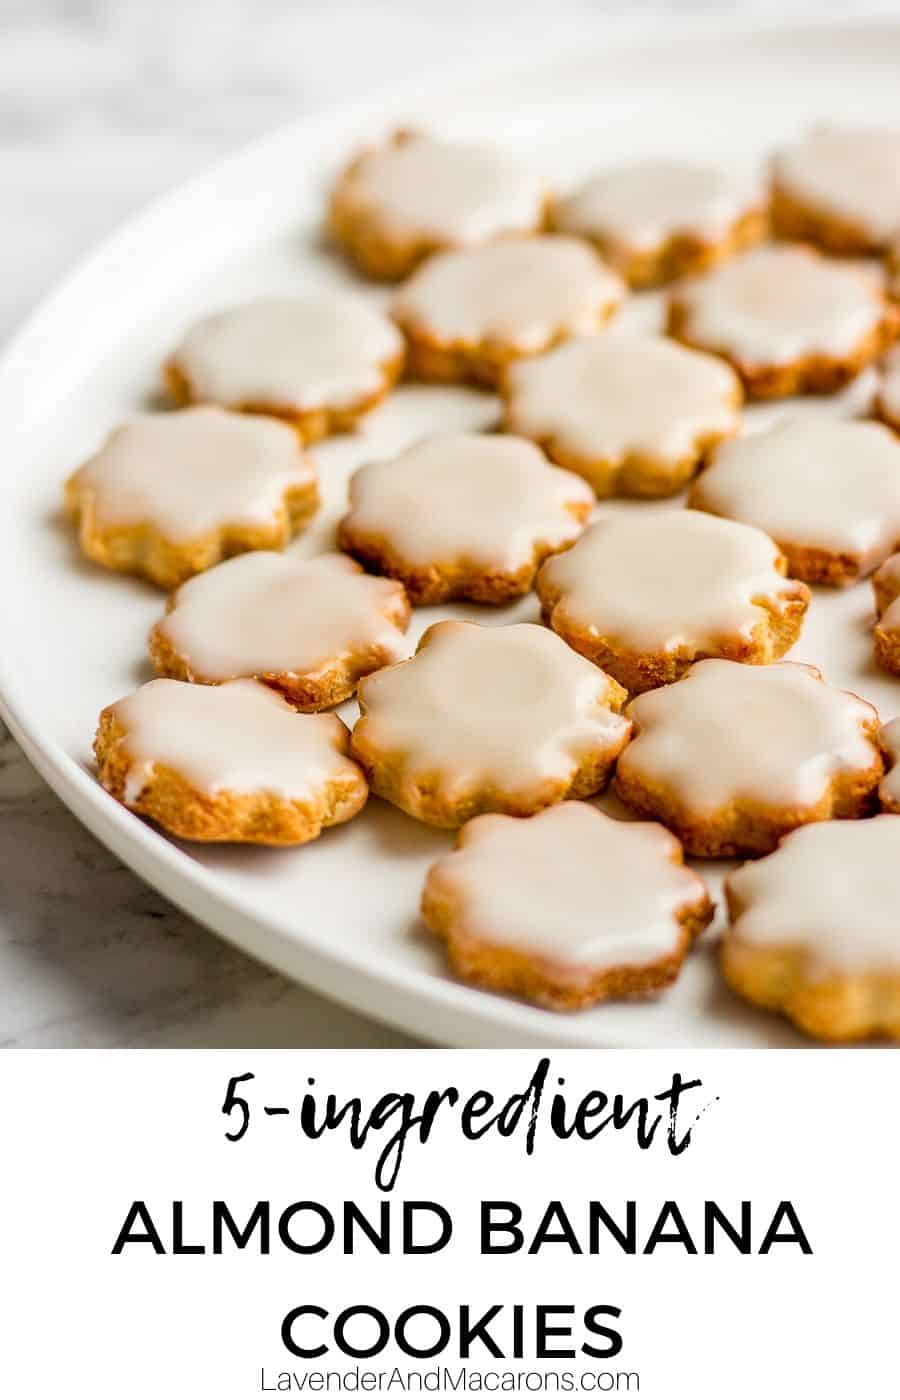 Almond Banana Cookies pin